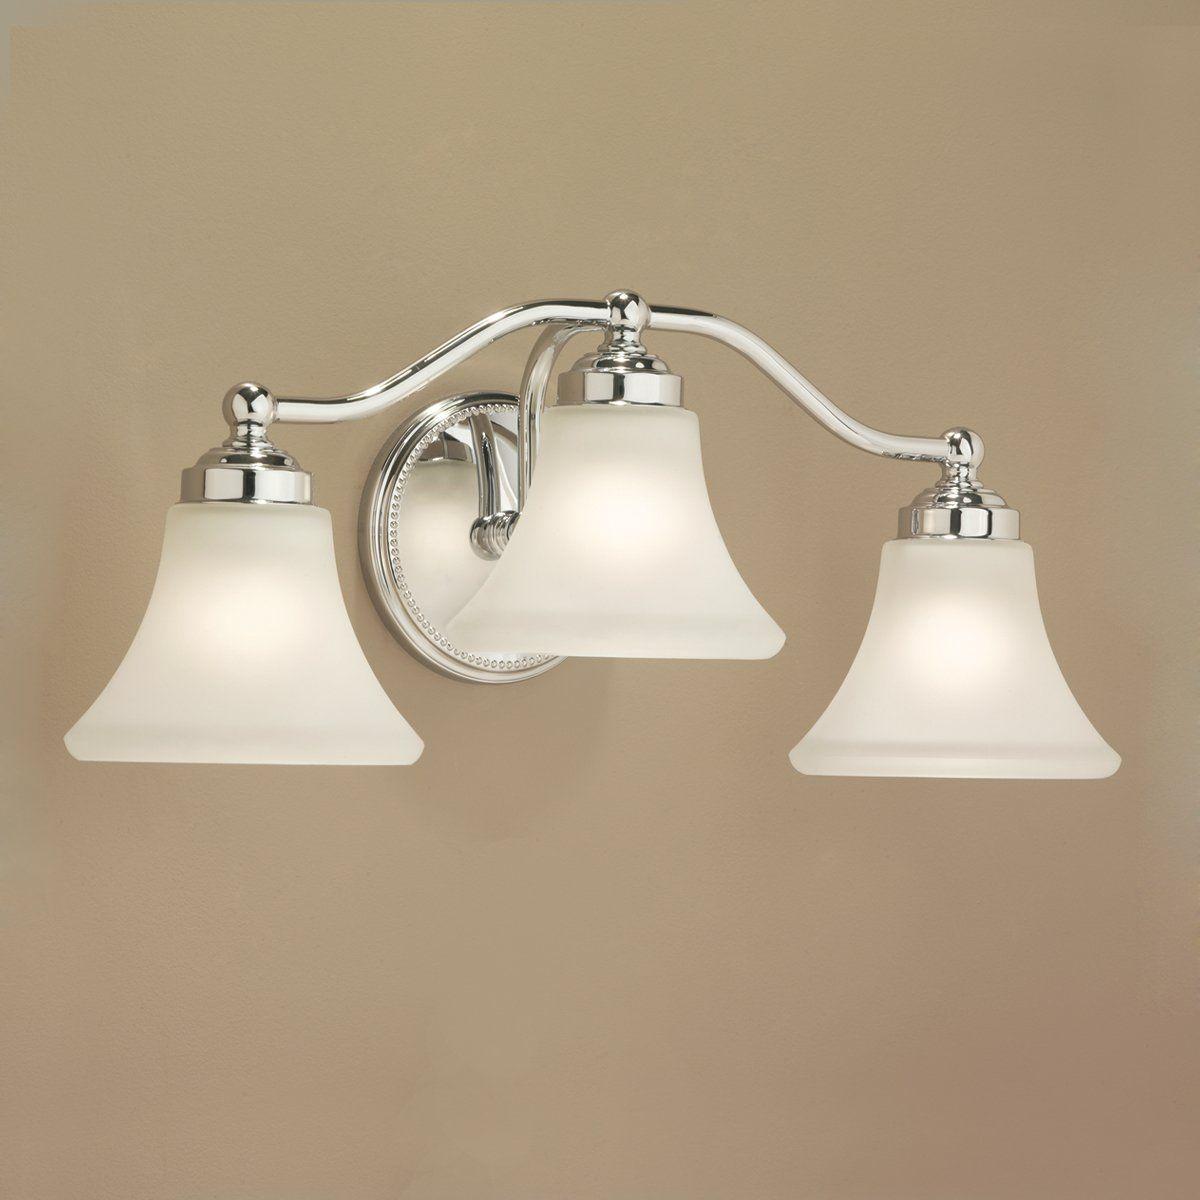 Bathroom Lighting Universe norwell 9663 3 light soleil wall sconce - lighting universe   bath